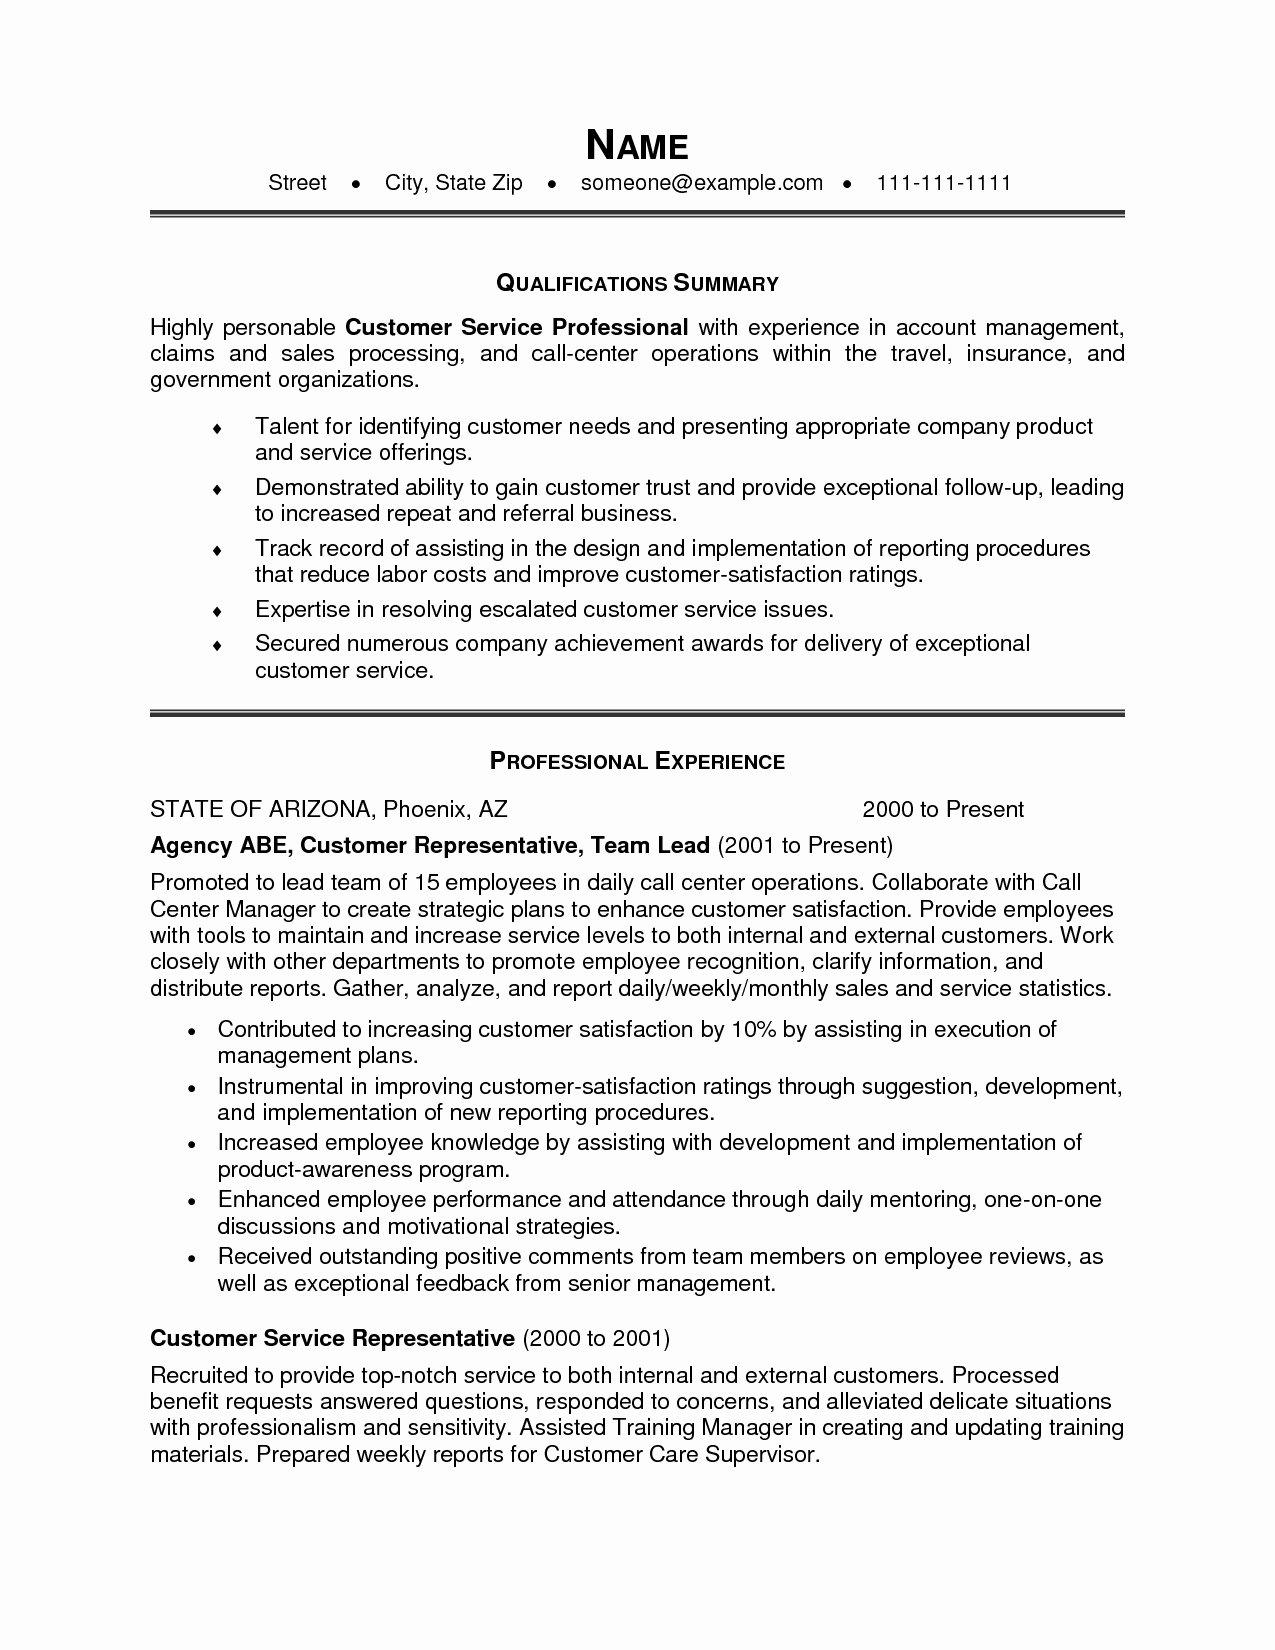 Csr Resume Objective Customer Service Representative